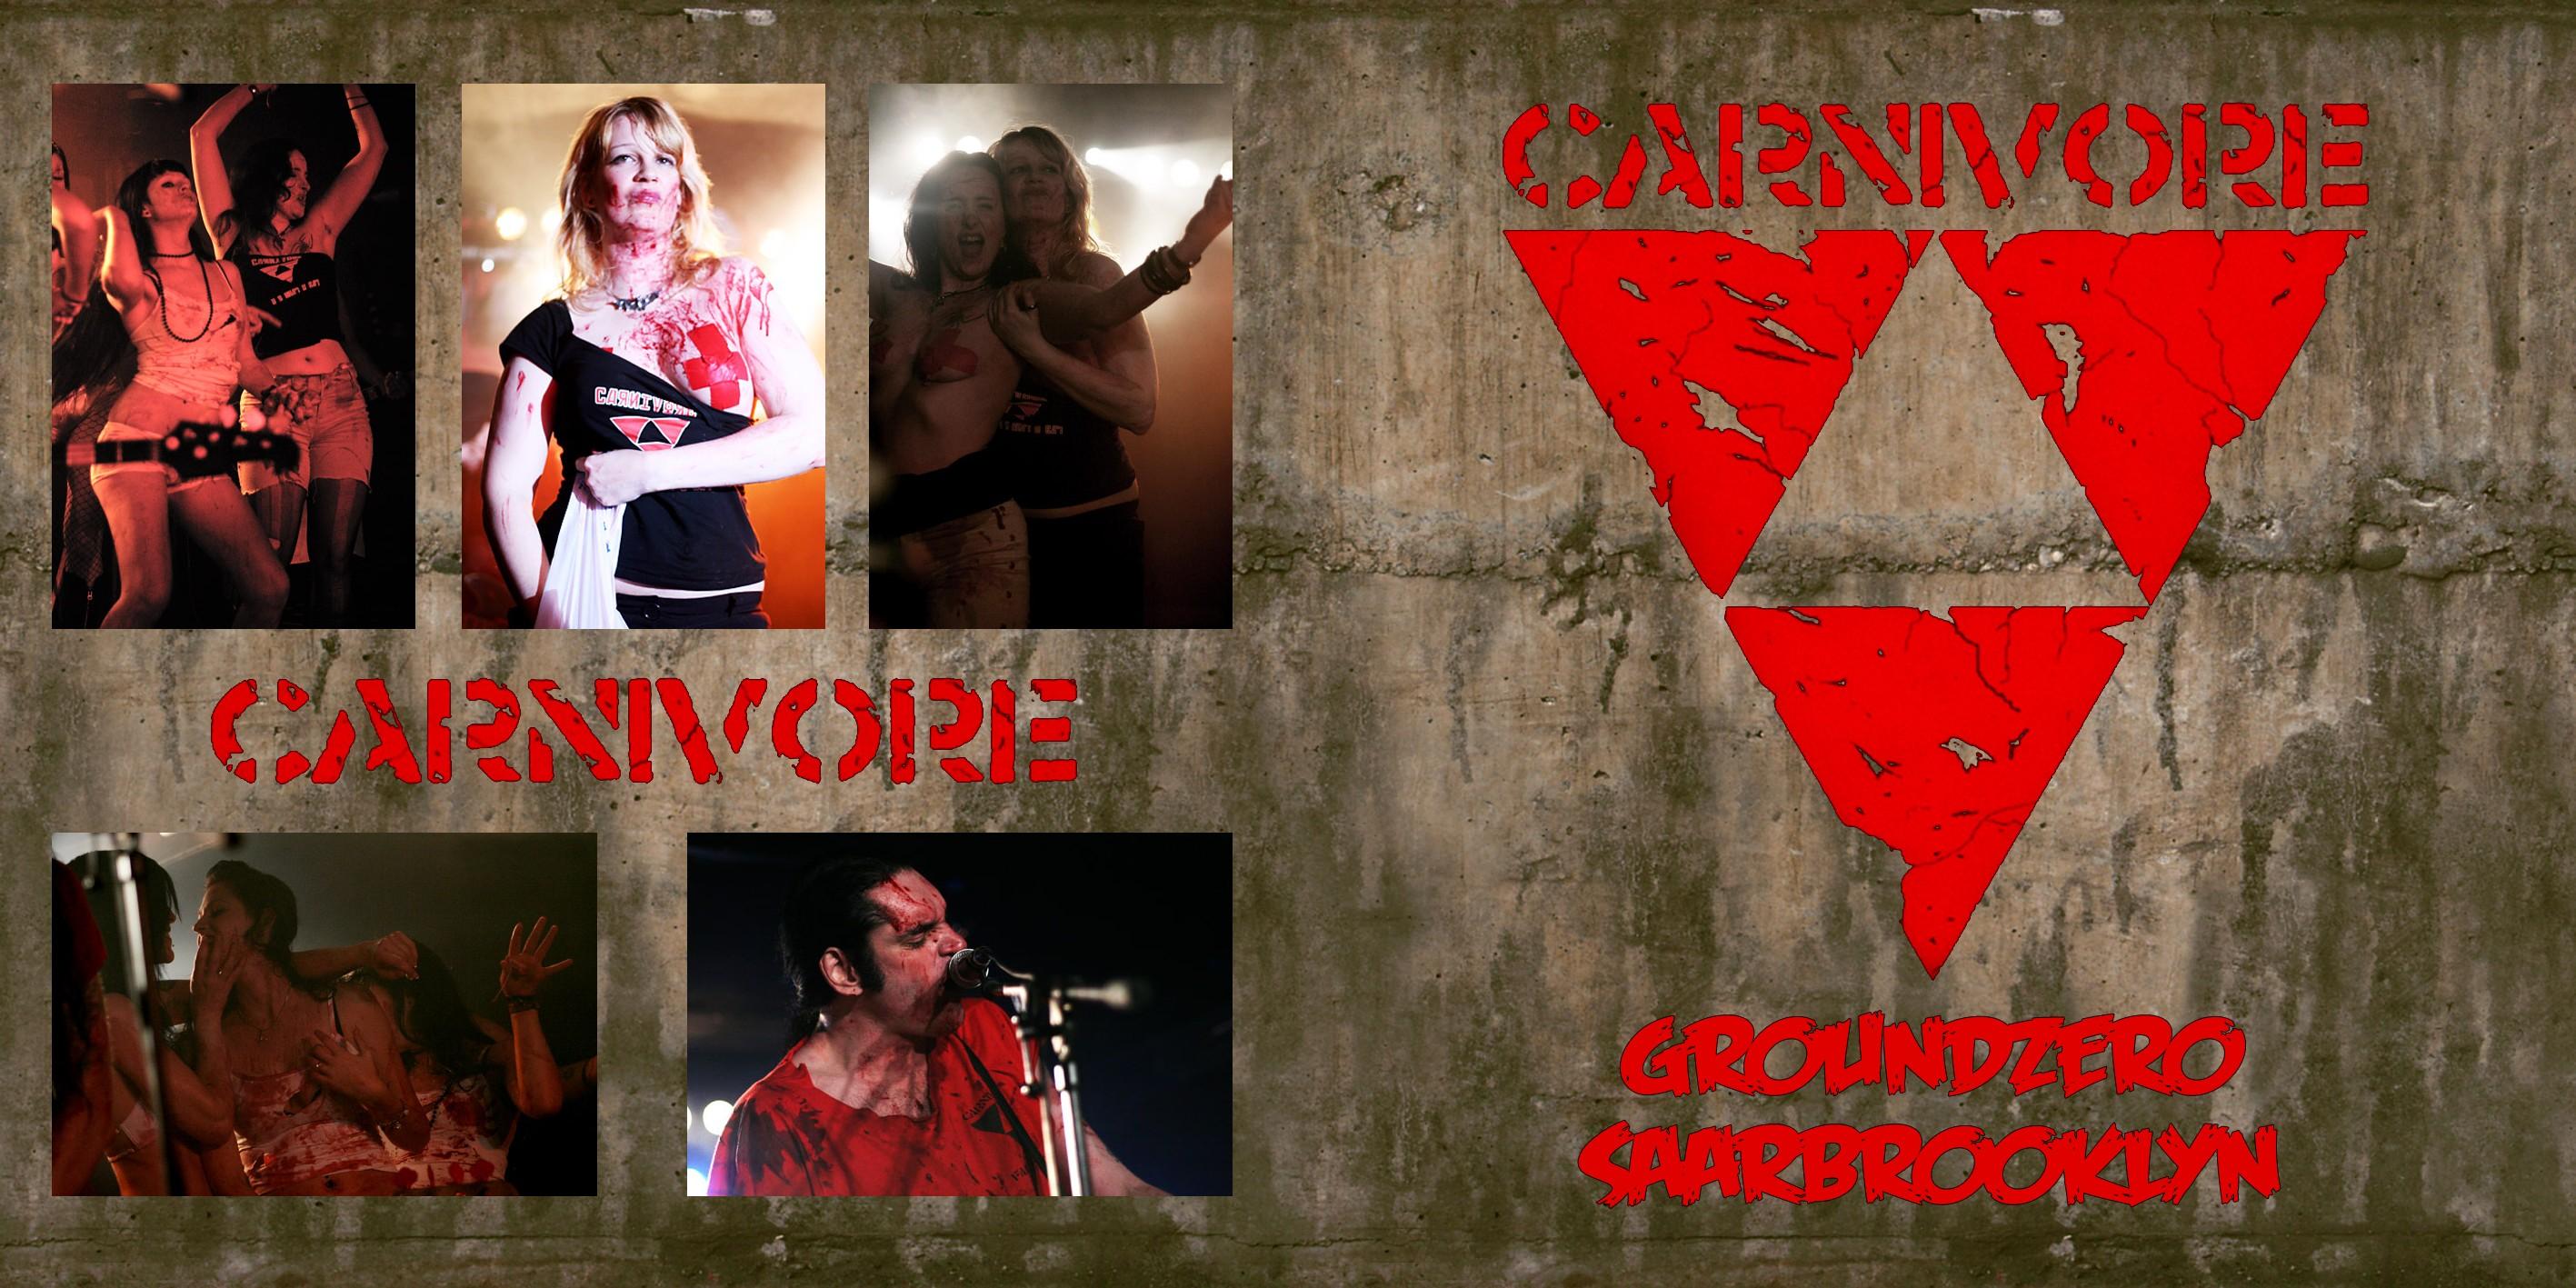 Carnivore - Live - 2007